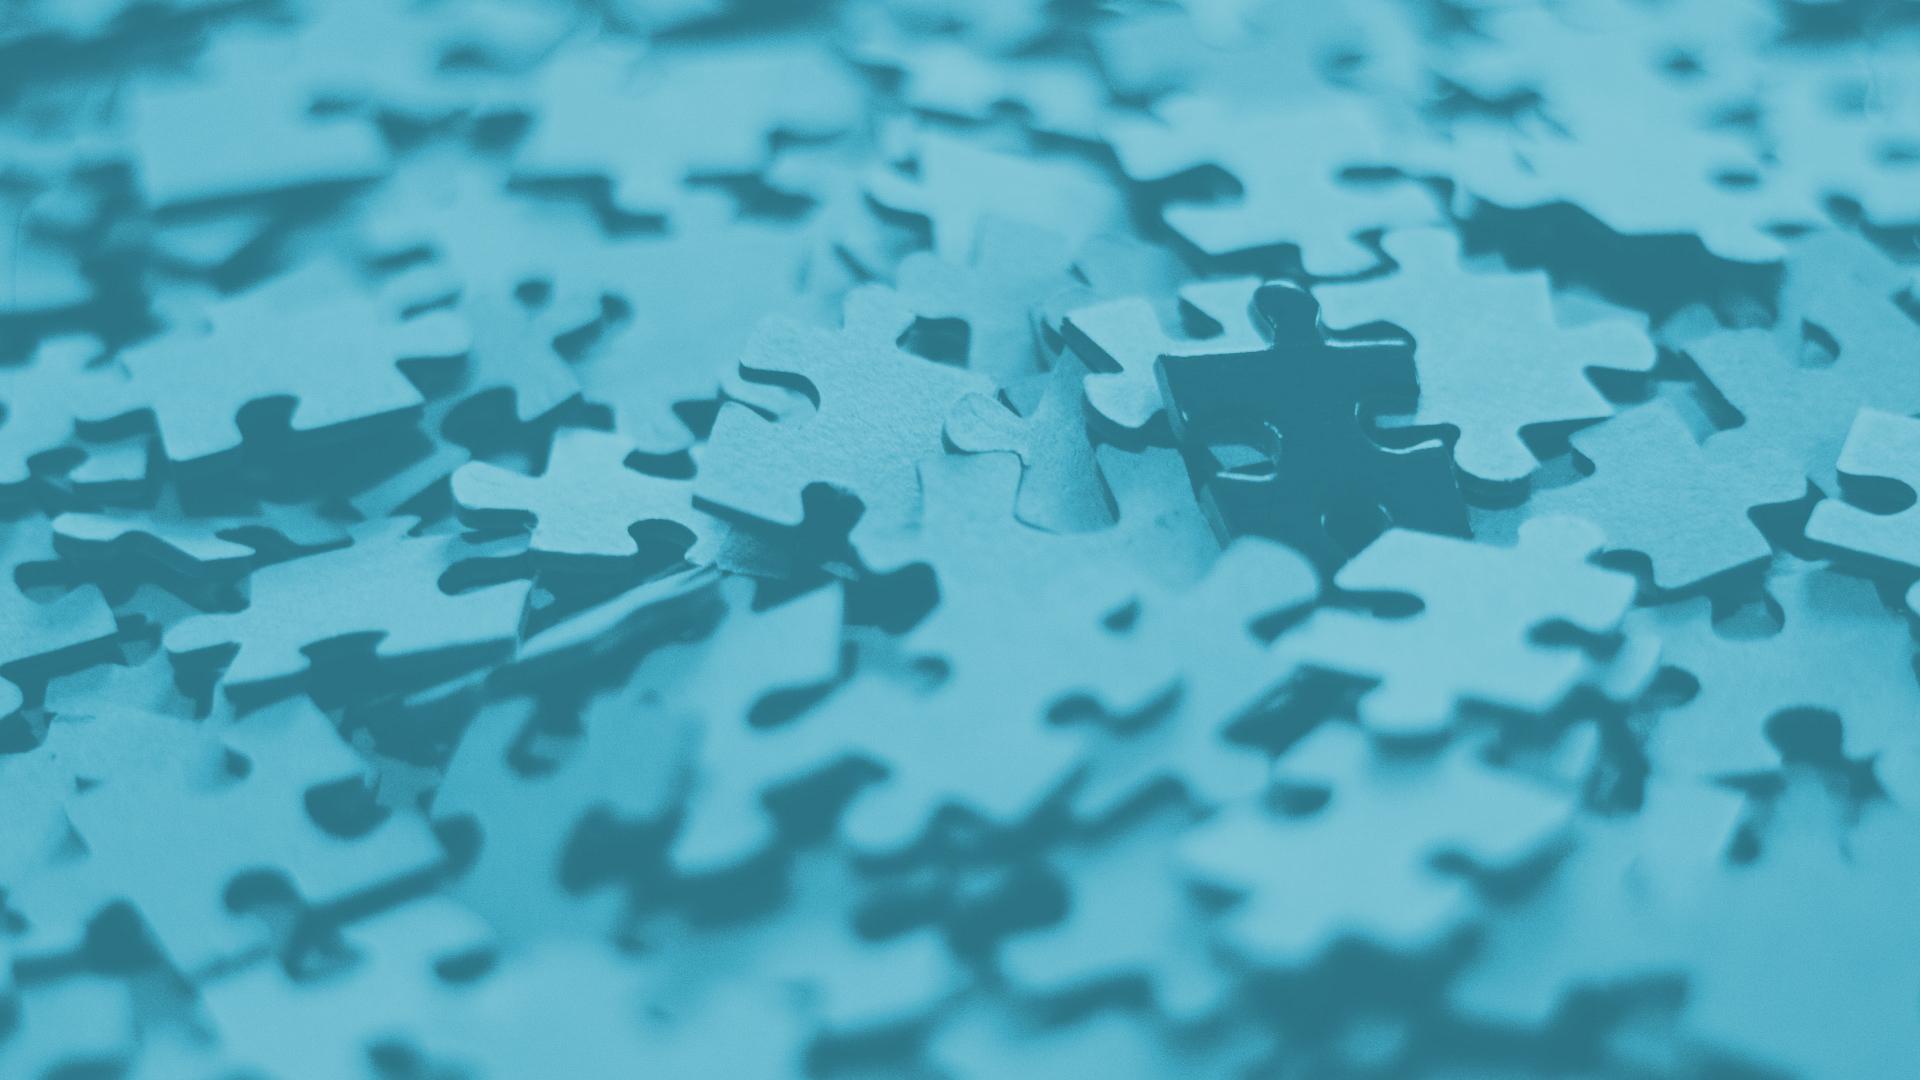 Advanced Lean Tools - for Innovative Problem Solving Teams